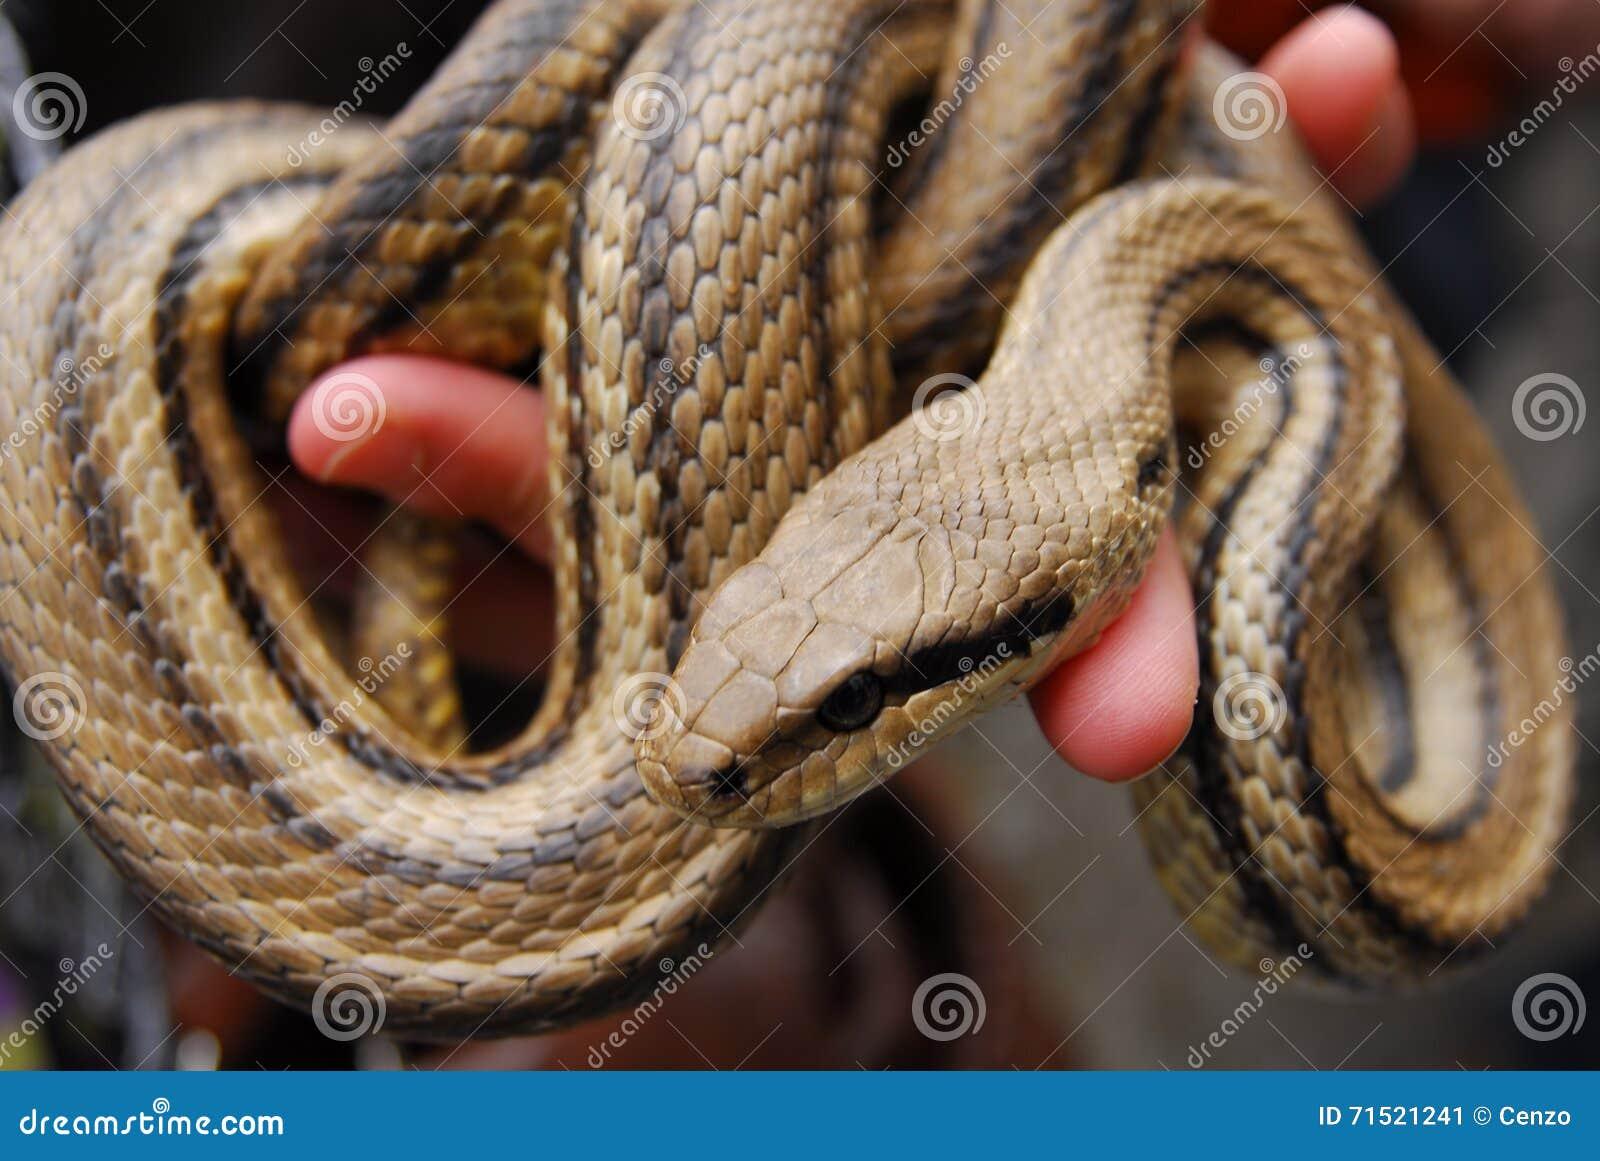 Festival of snakes cervone harmless snake stock image for Serpente cervone